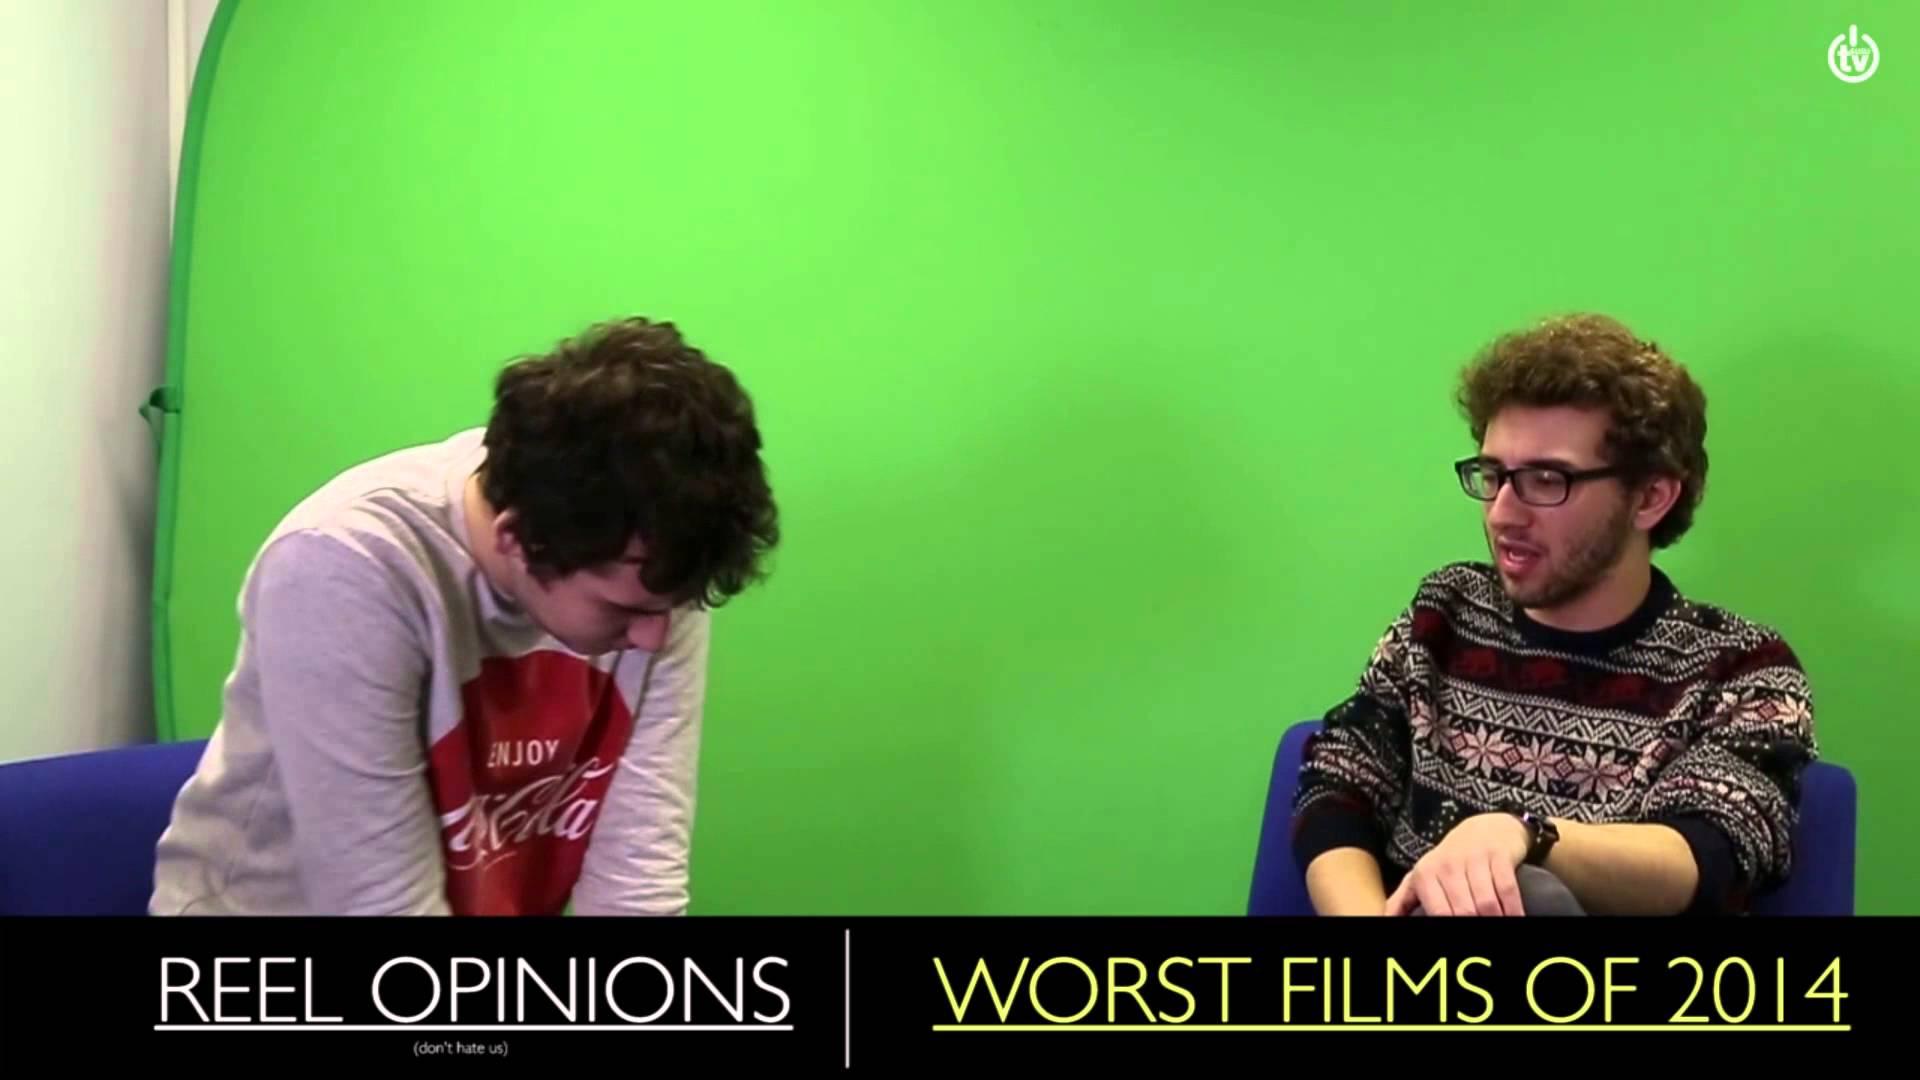 Worst Films of 2014